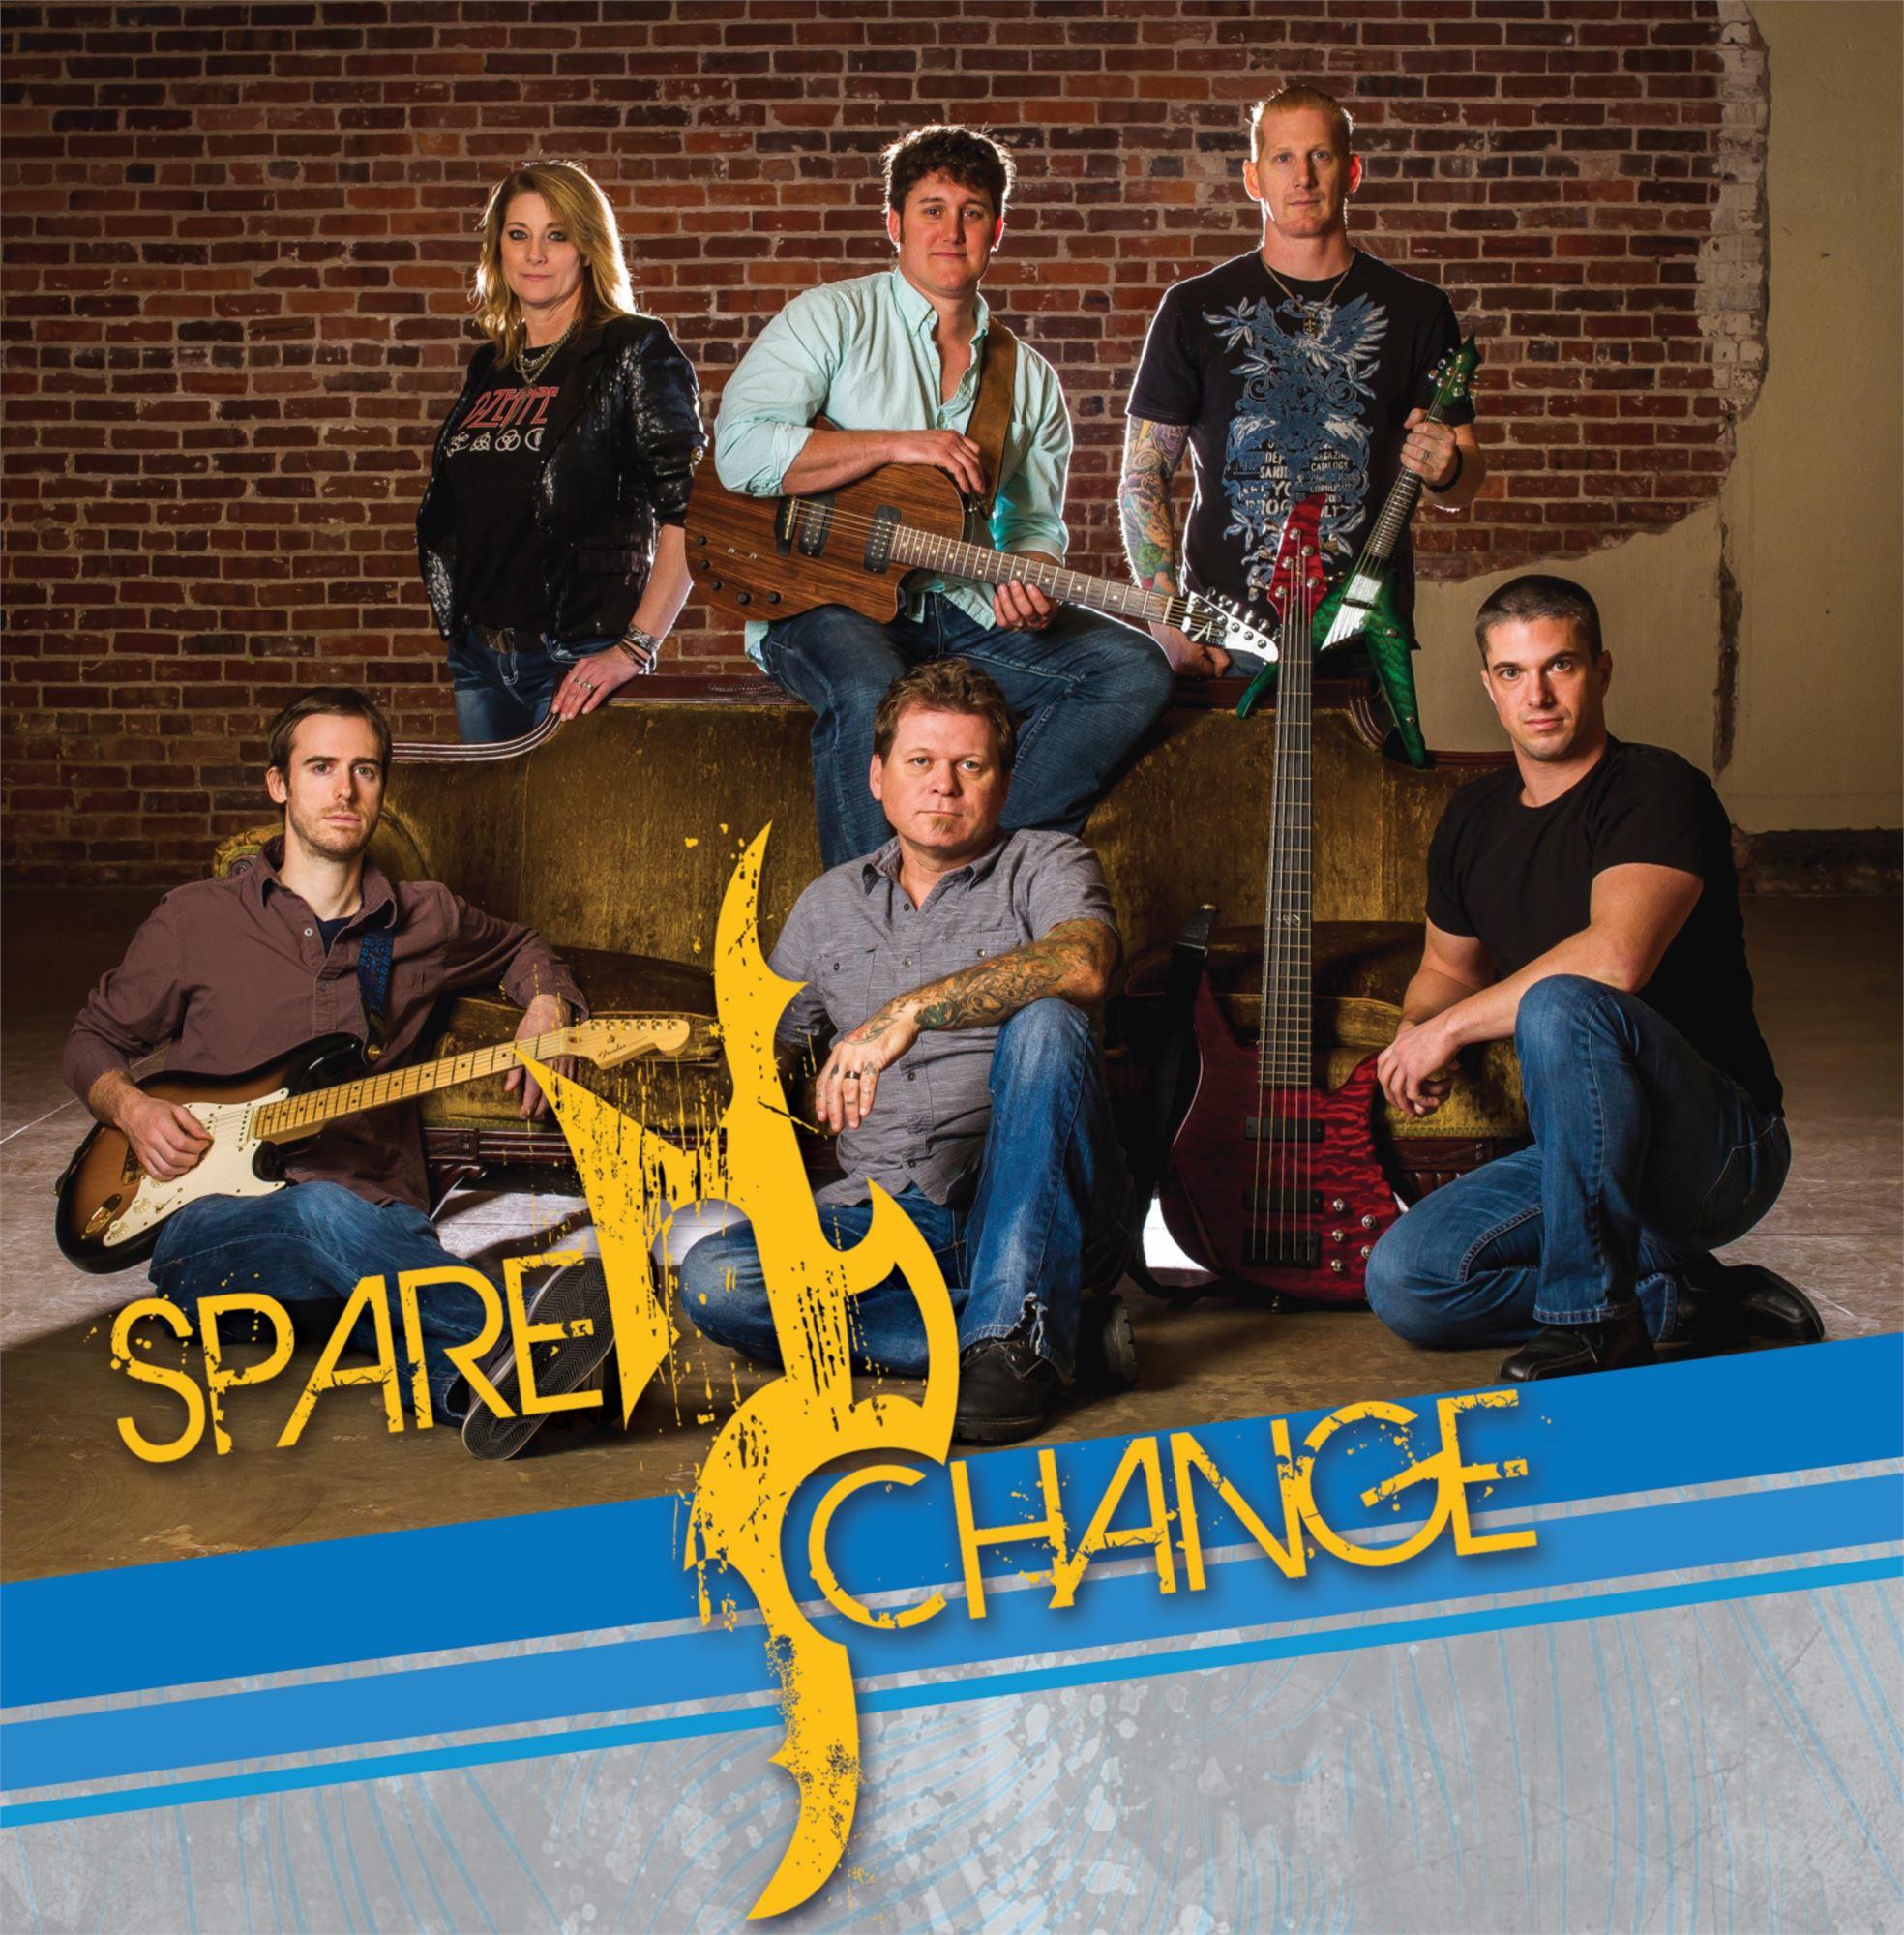 Spare Change 12 PM